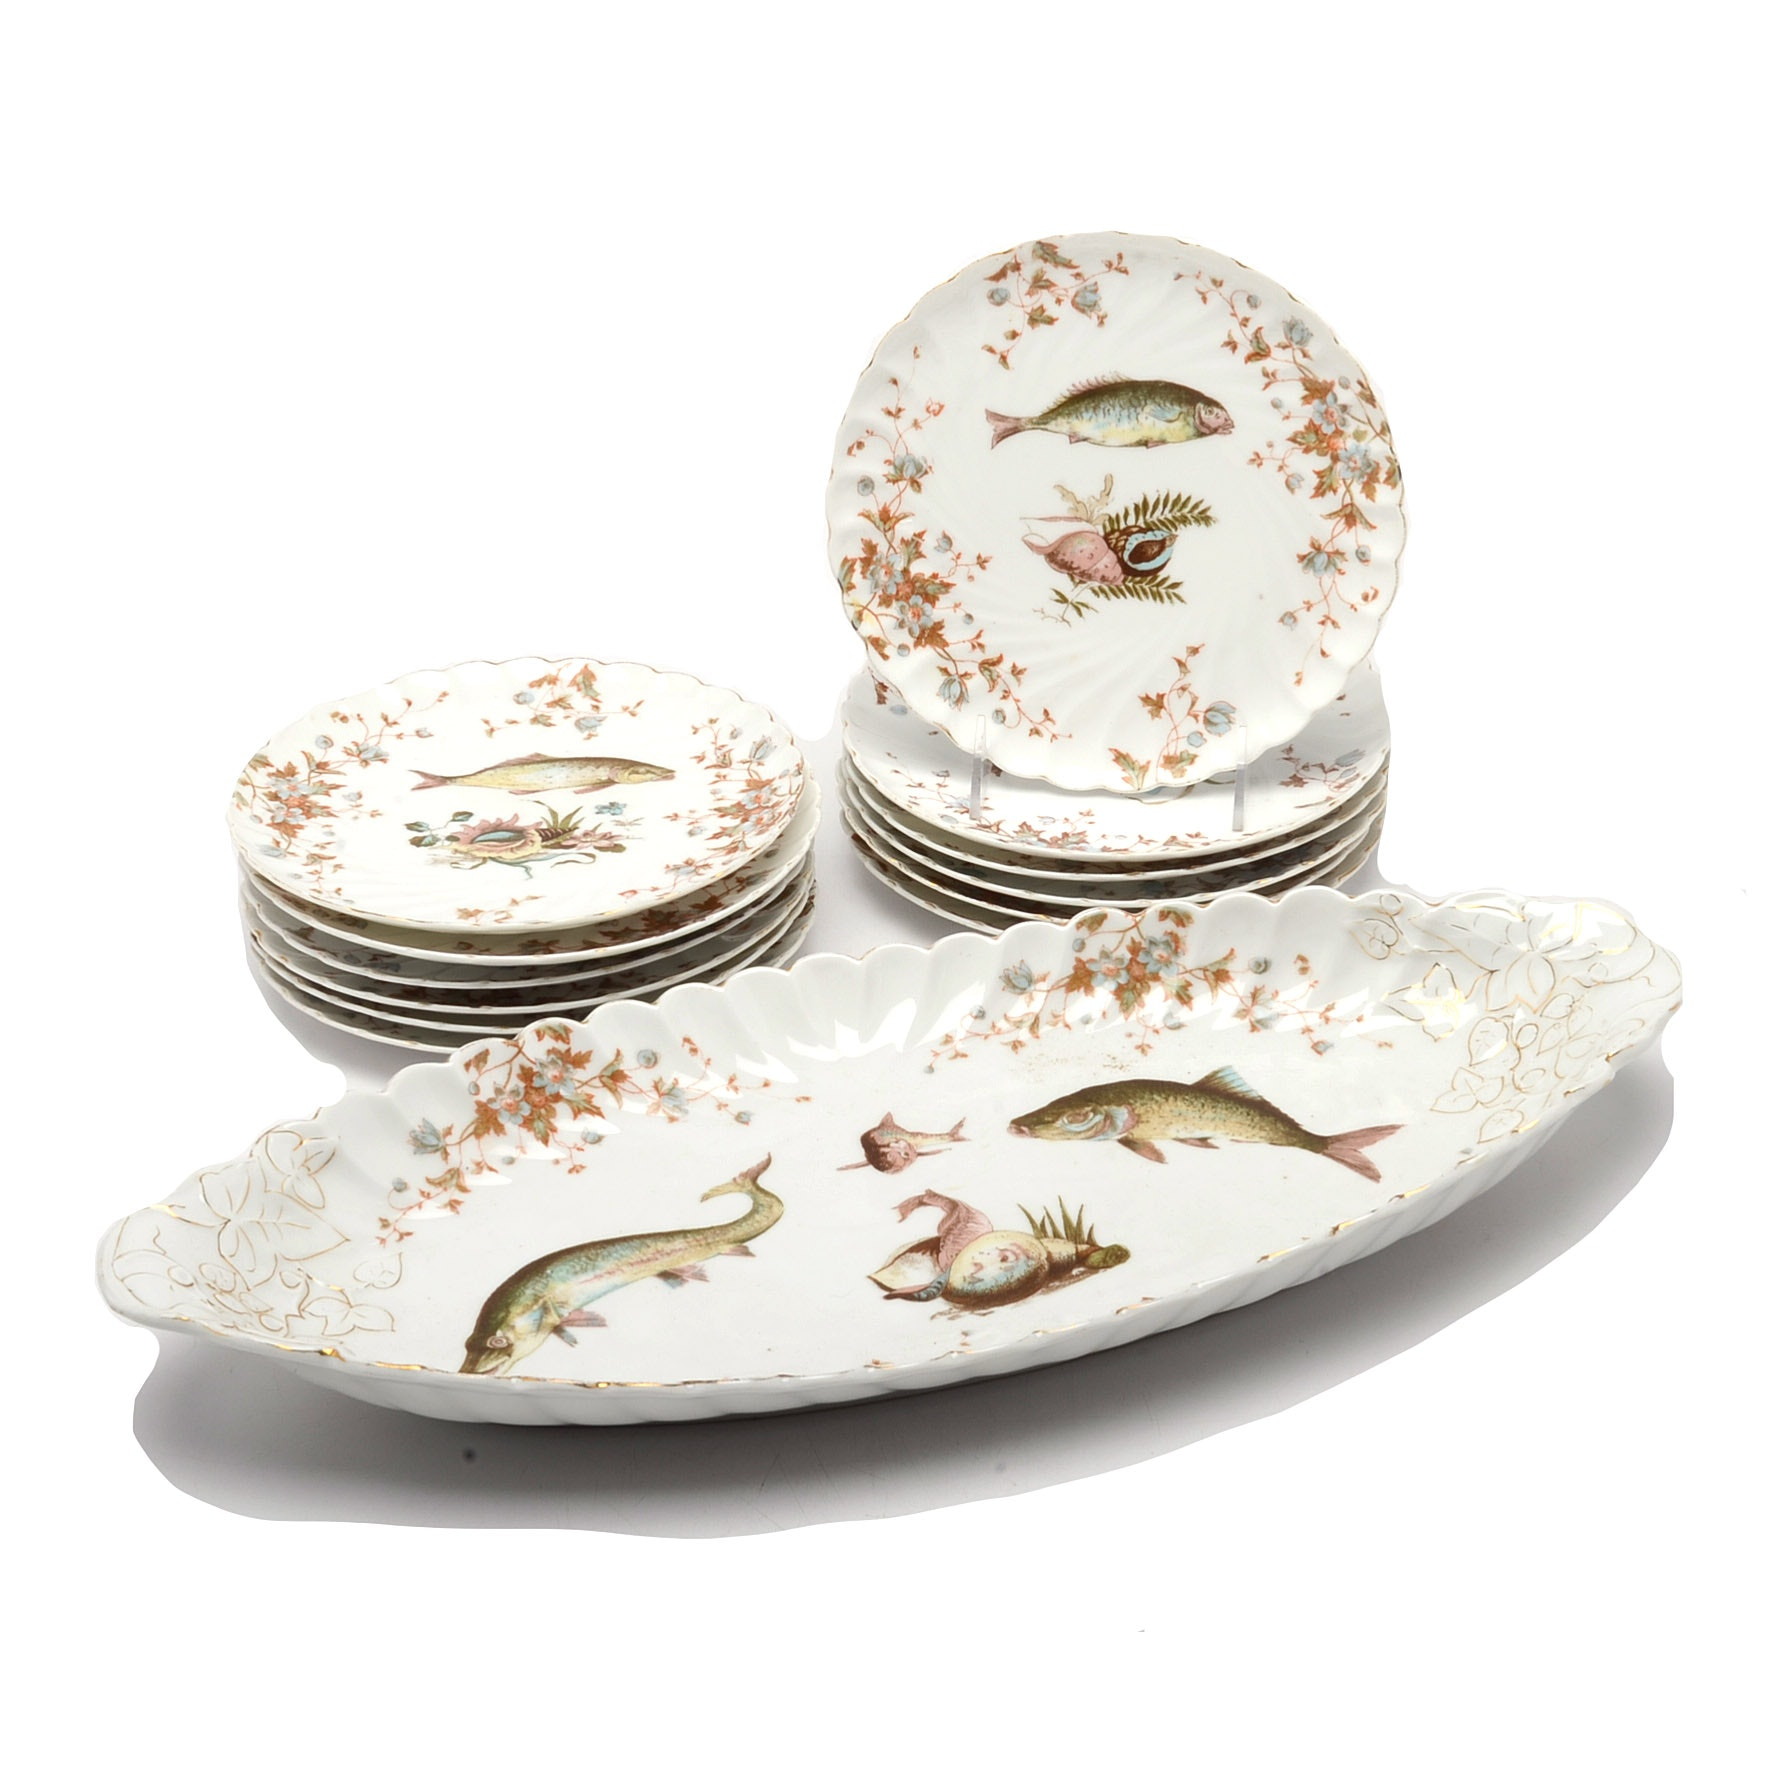 Lewis Strauss & Sons Porcelain Serving Platter and Dessert Plates